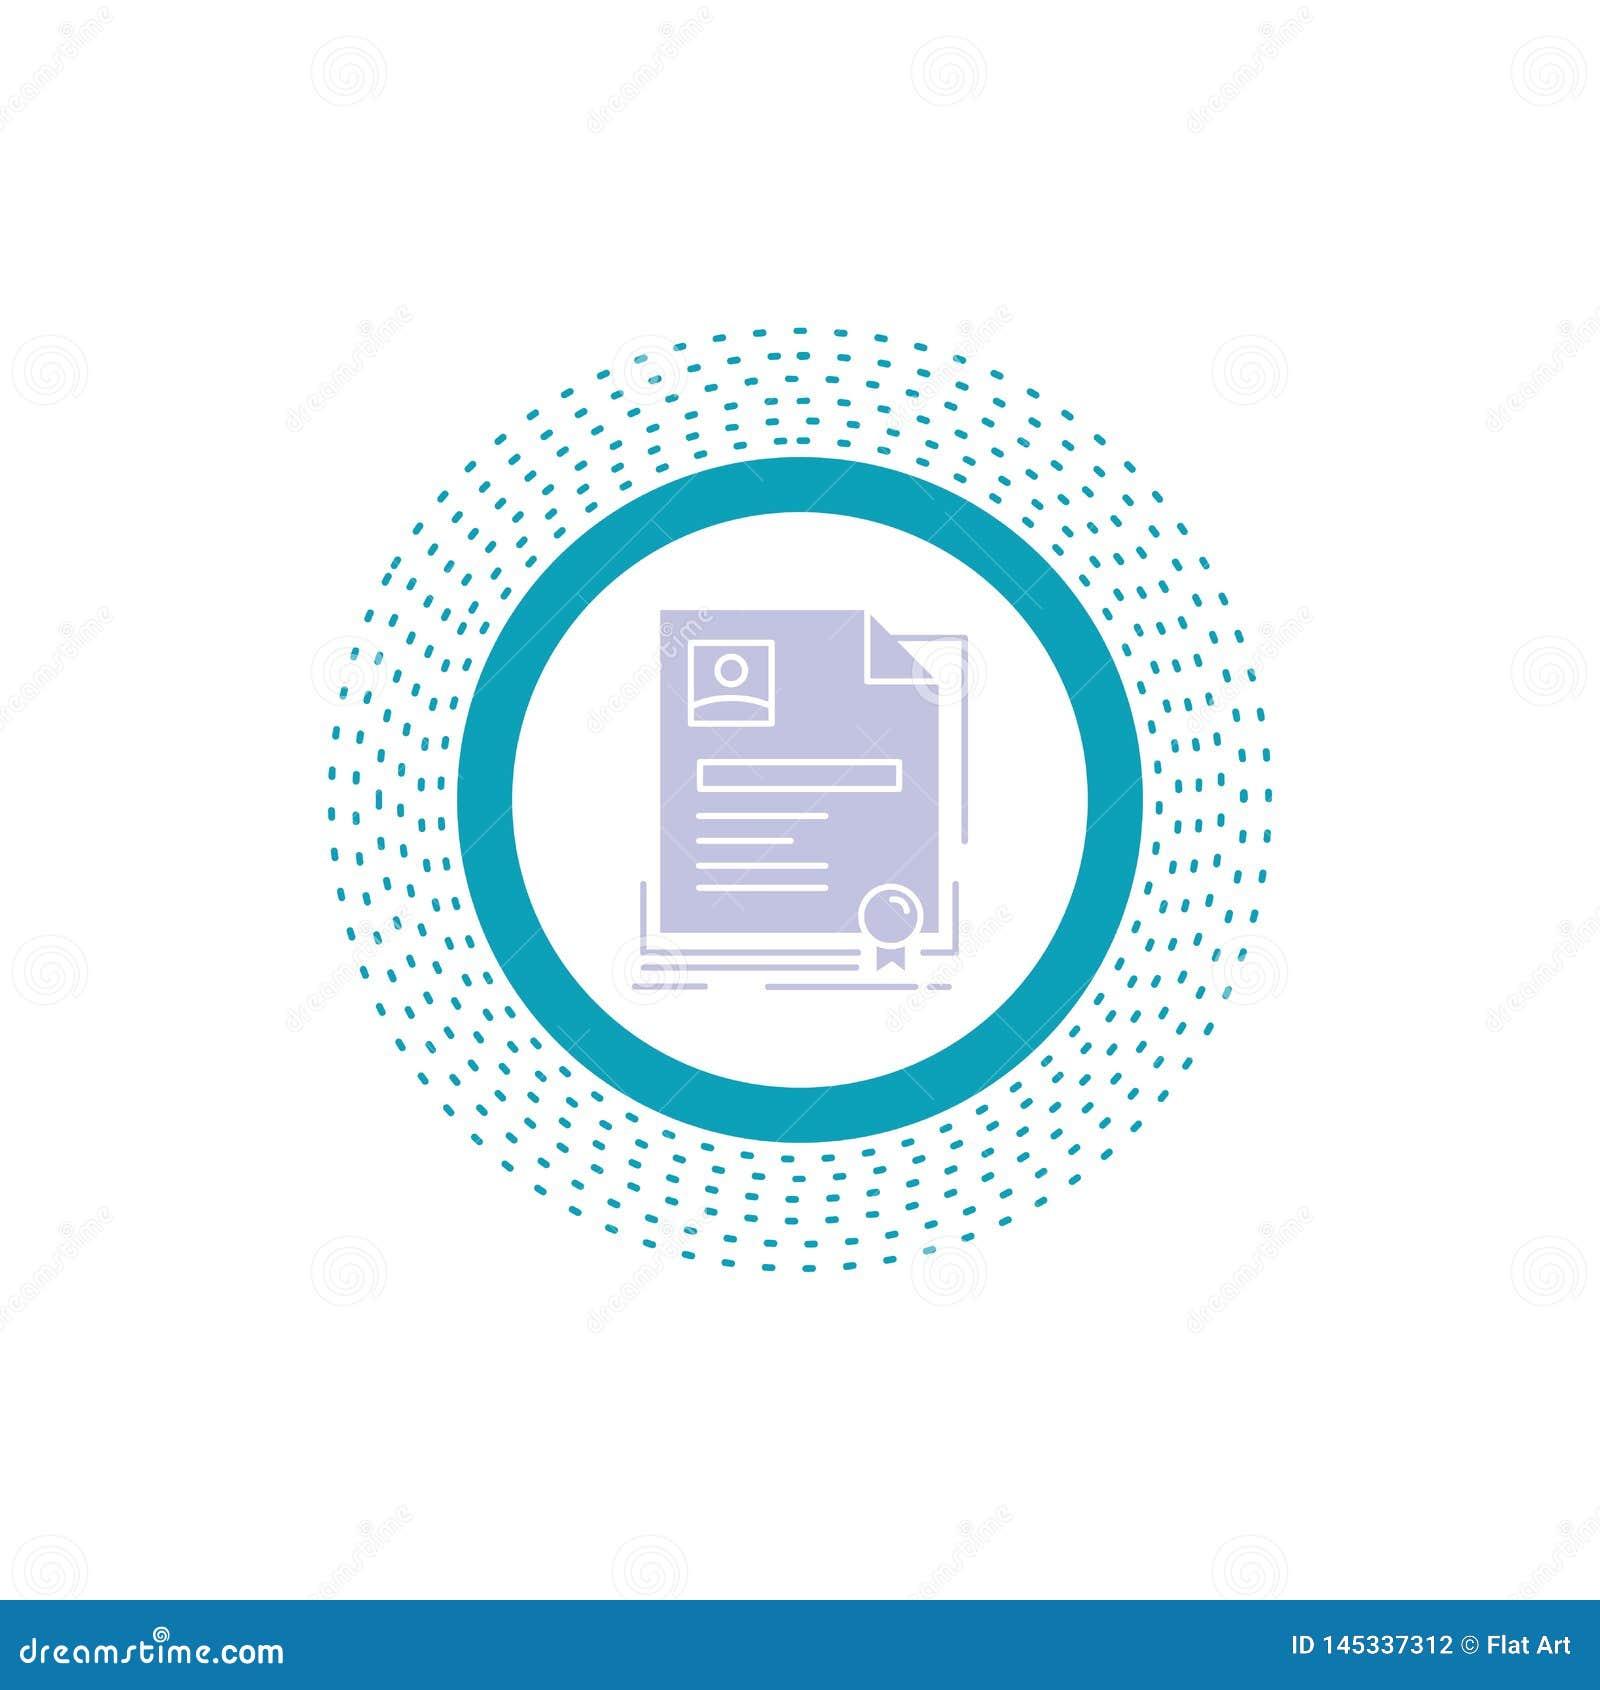 Vertrag, Ausweis, Gesch?ft, Vereinbarung, Zertifikat Glyph-Ikone Vektor lokalisierte Illustration